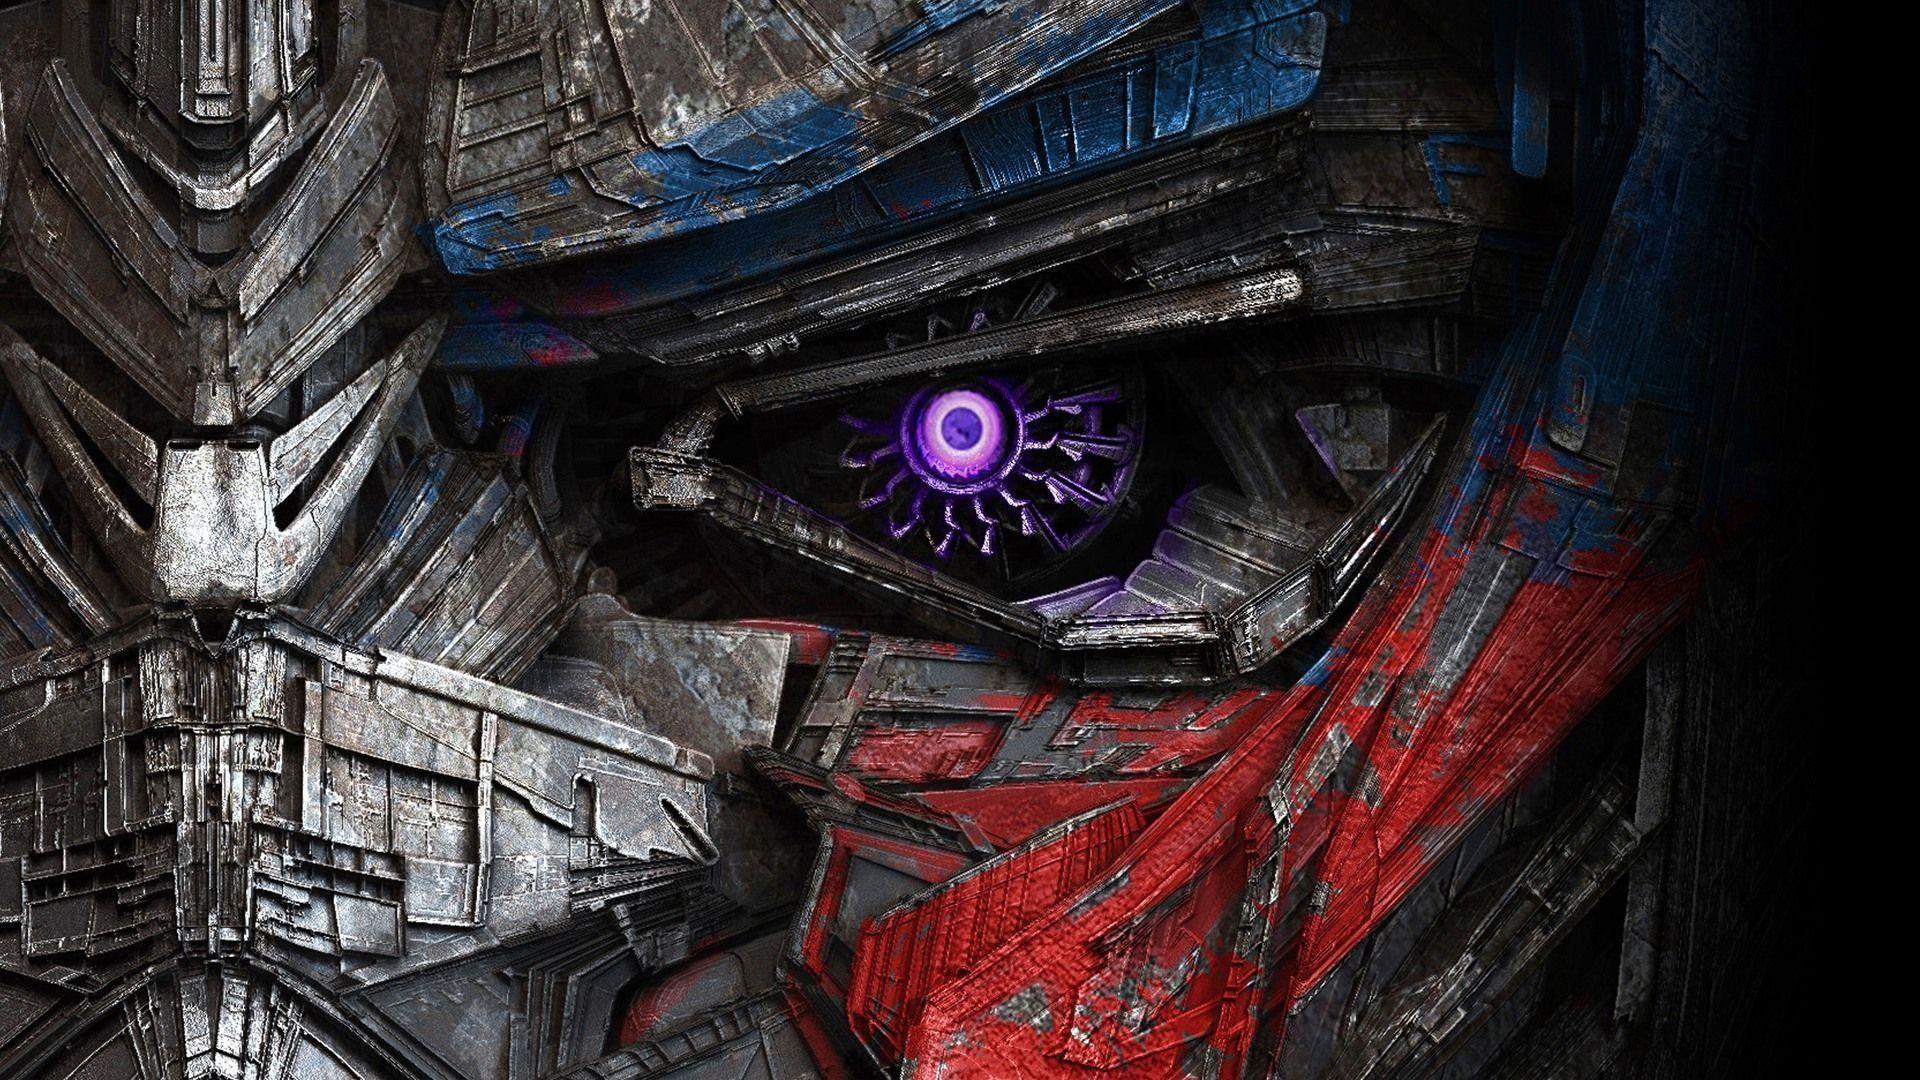 Imagenes De Transformers: Transformers 3 Wallpapers (66+ Images